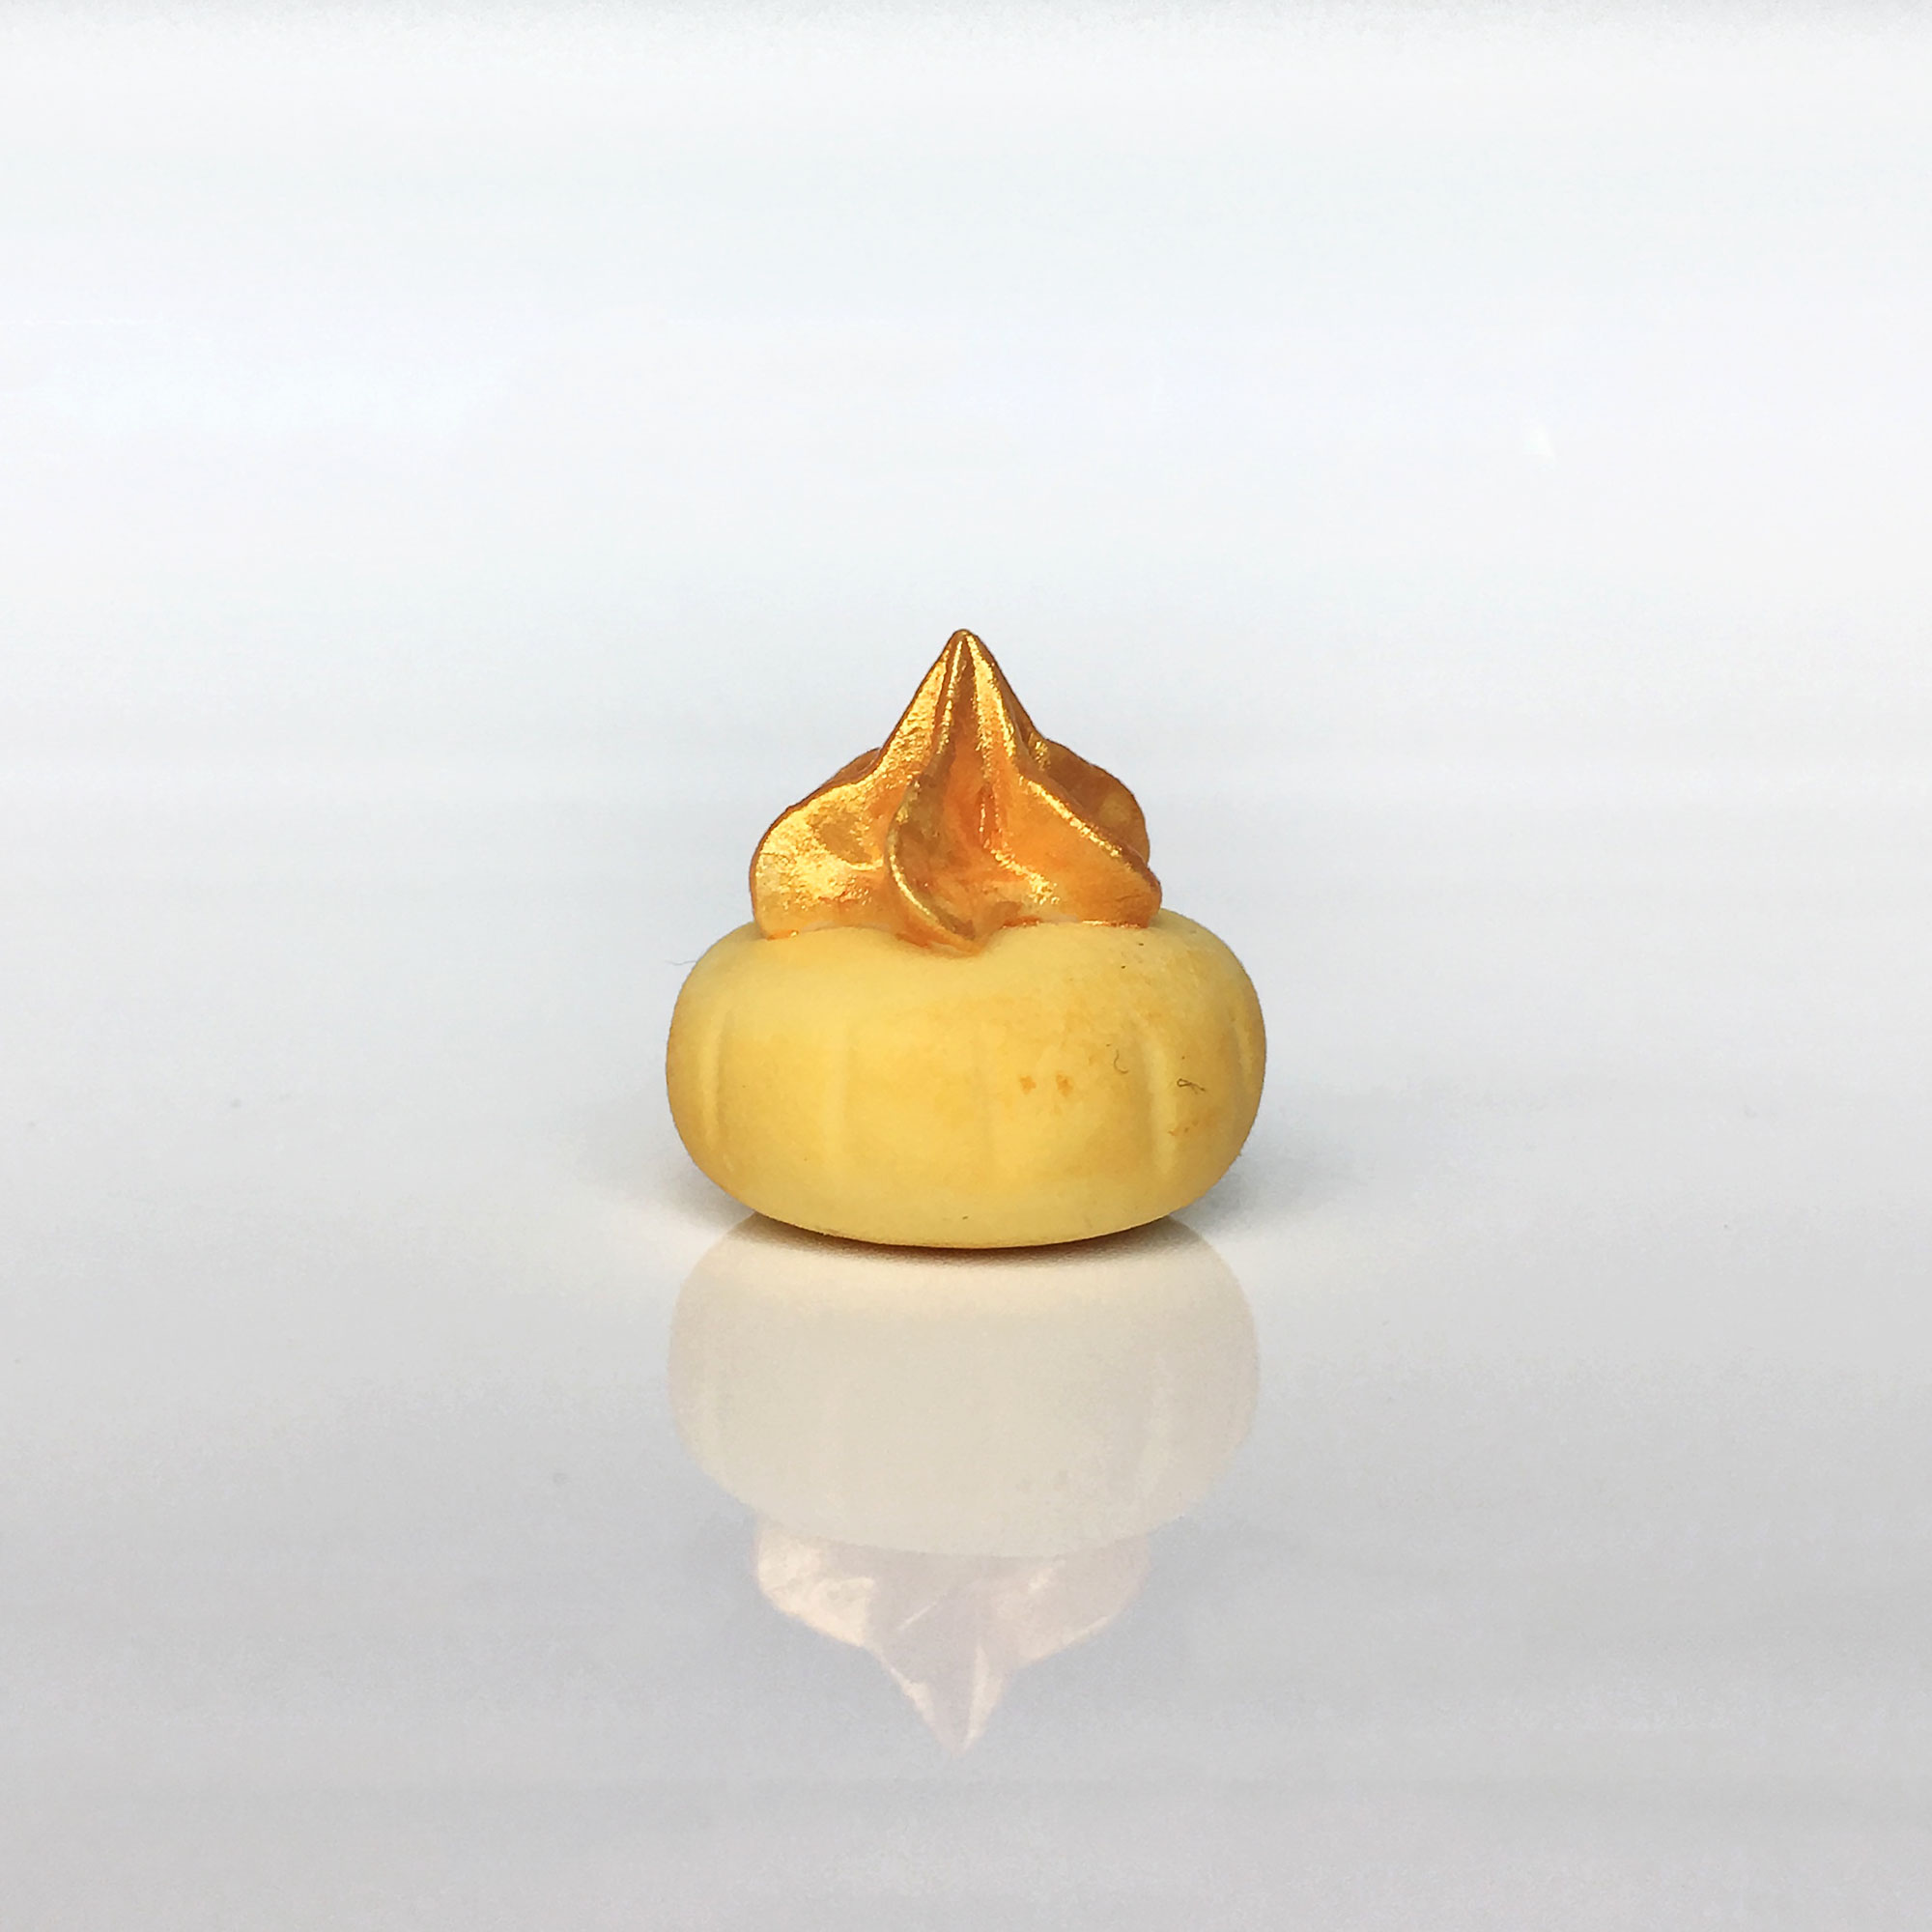 gold-shit1.jpg